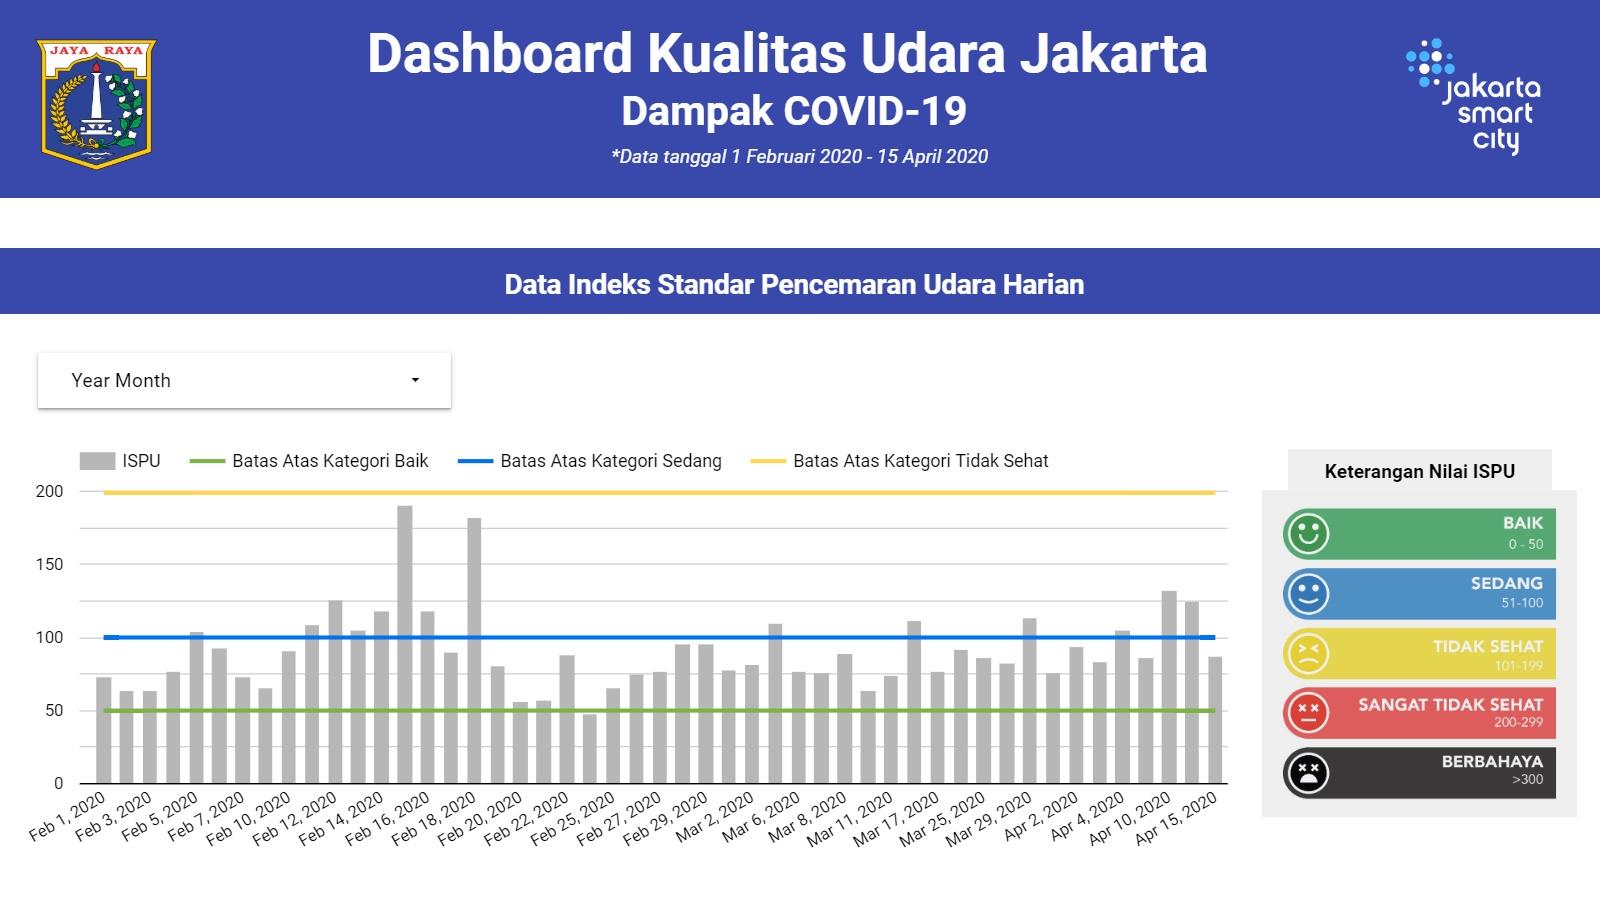 Dashboard Kualitas Udara Jakarta Selama Periode COVID-19